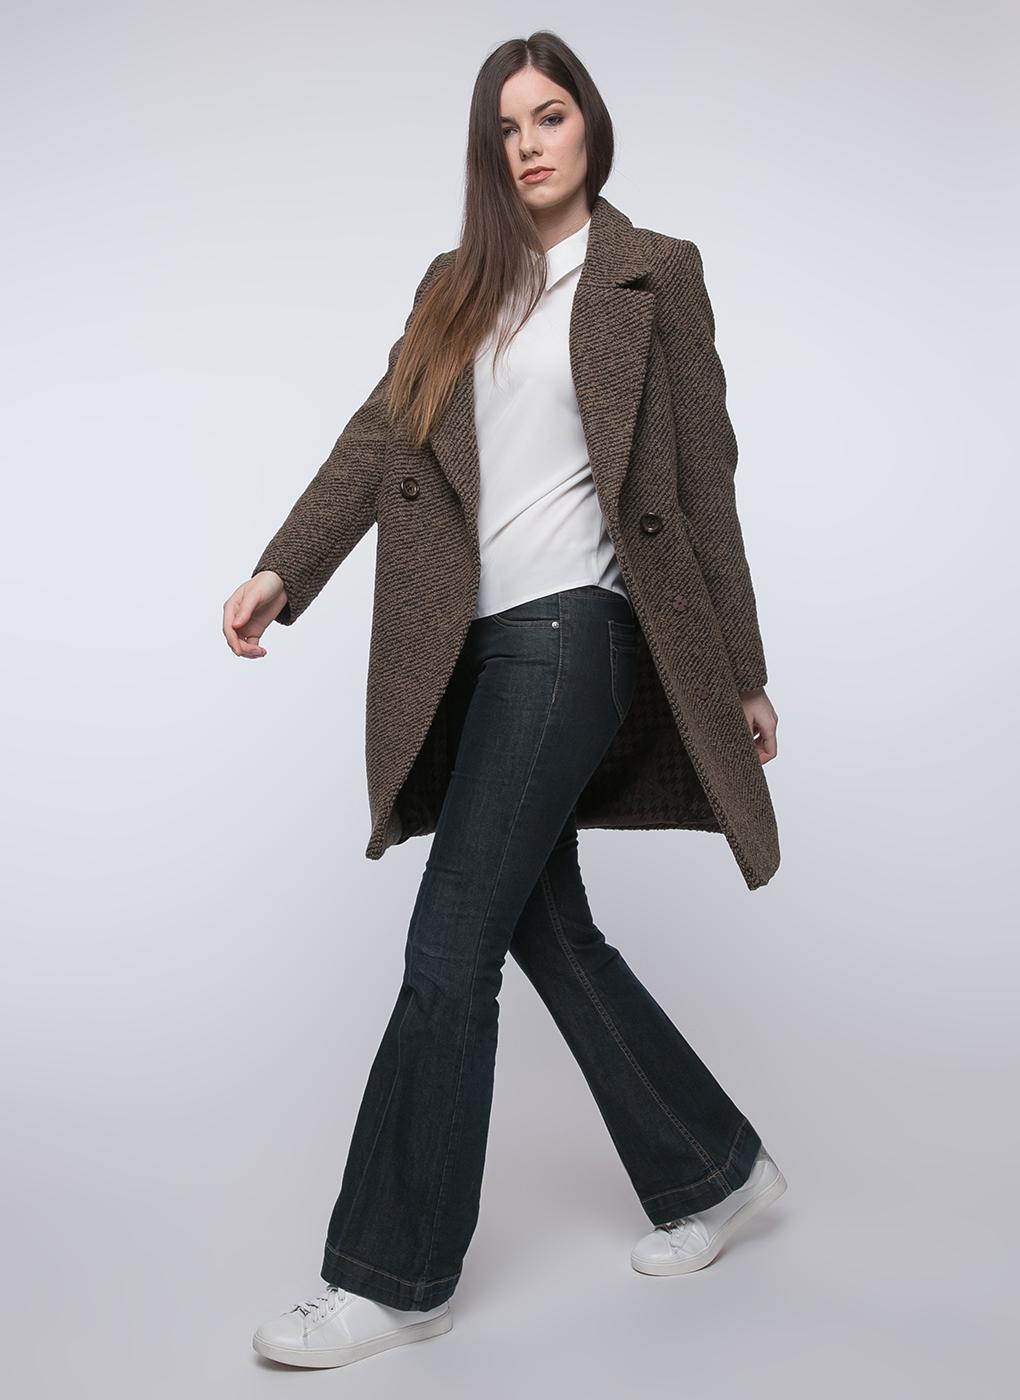 Пальто прямое шерстяное 40, idekka фото